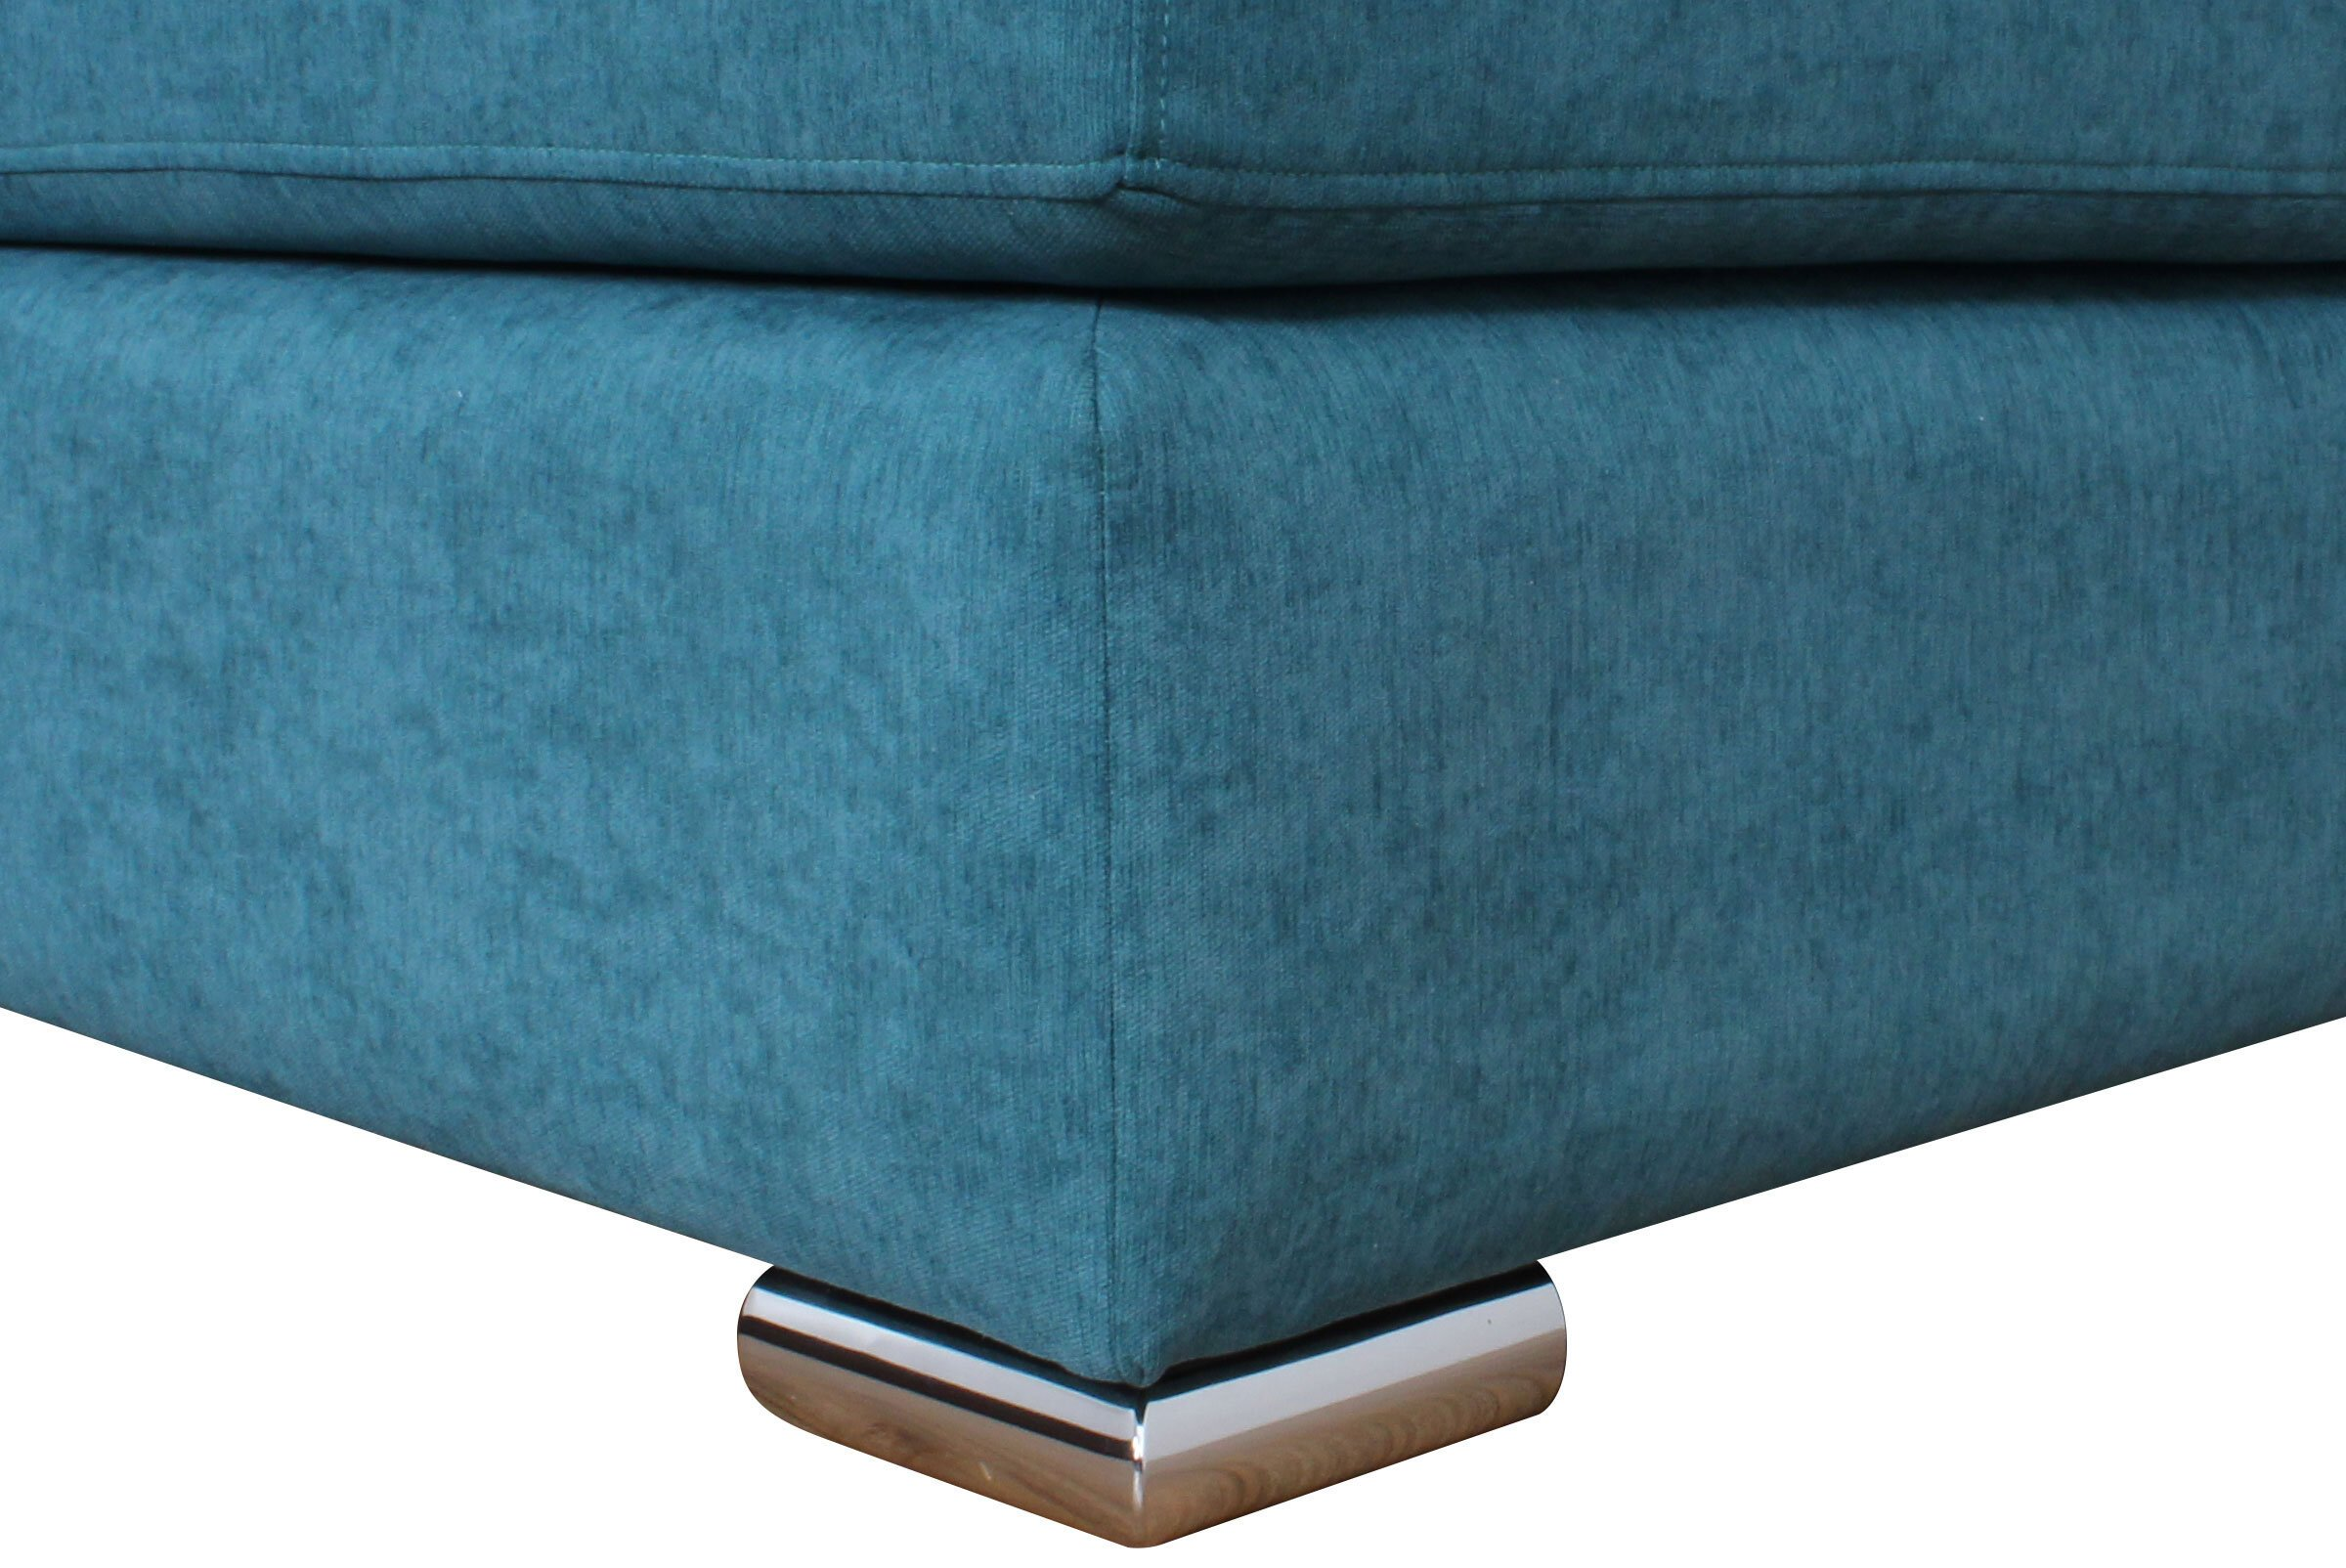 Sofa Modular Iz Mecha Pata Metalica33